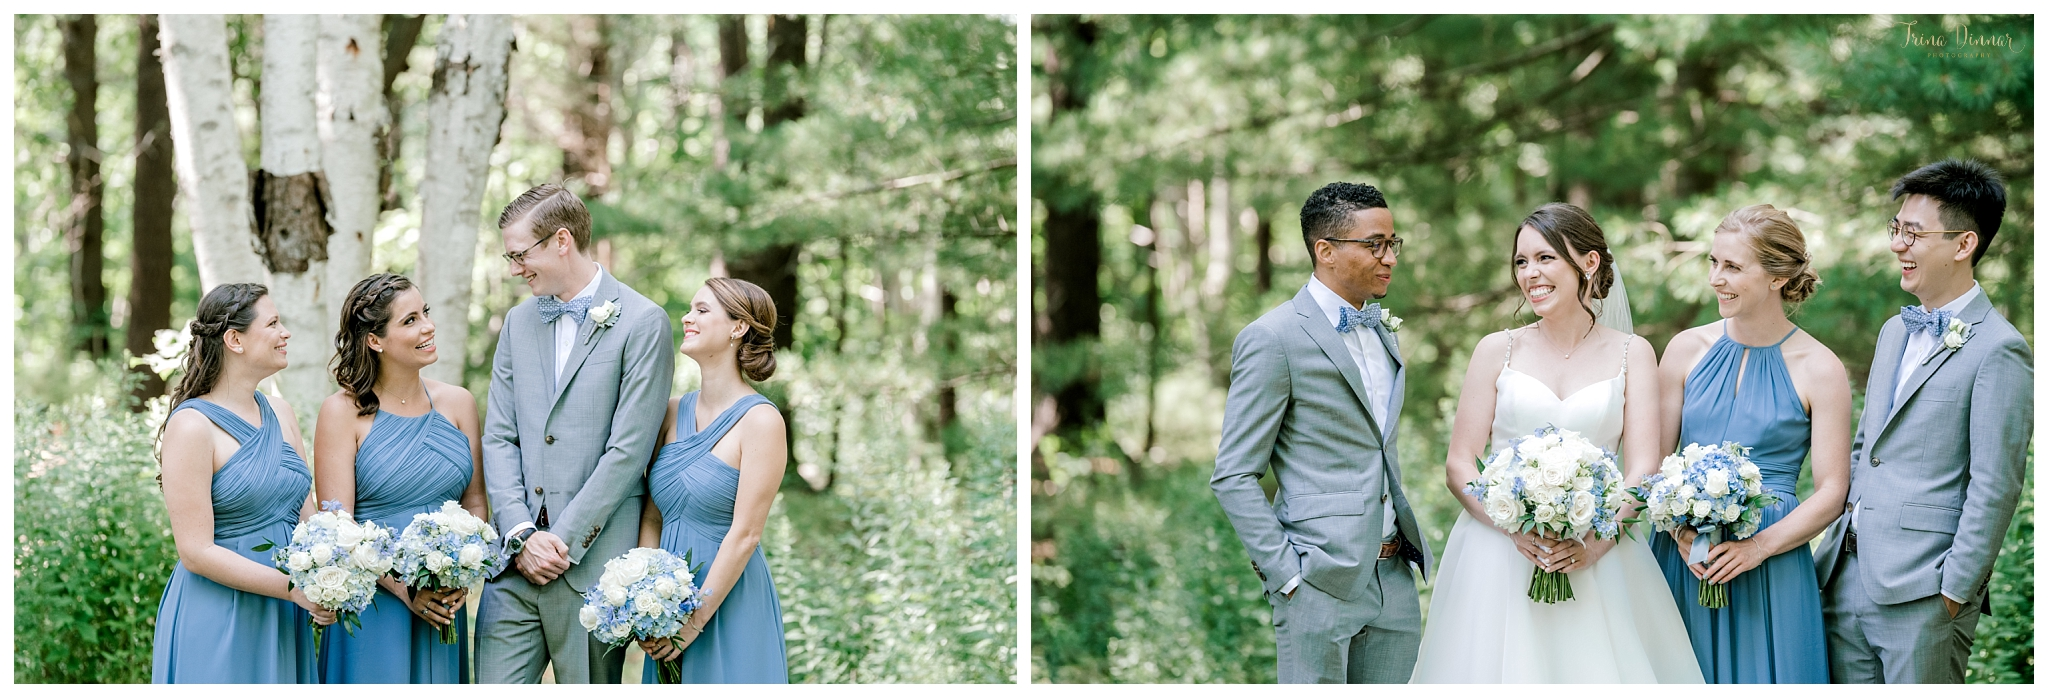 Gender Neutral Maine Wedding Party Portraits